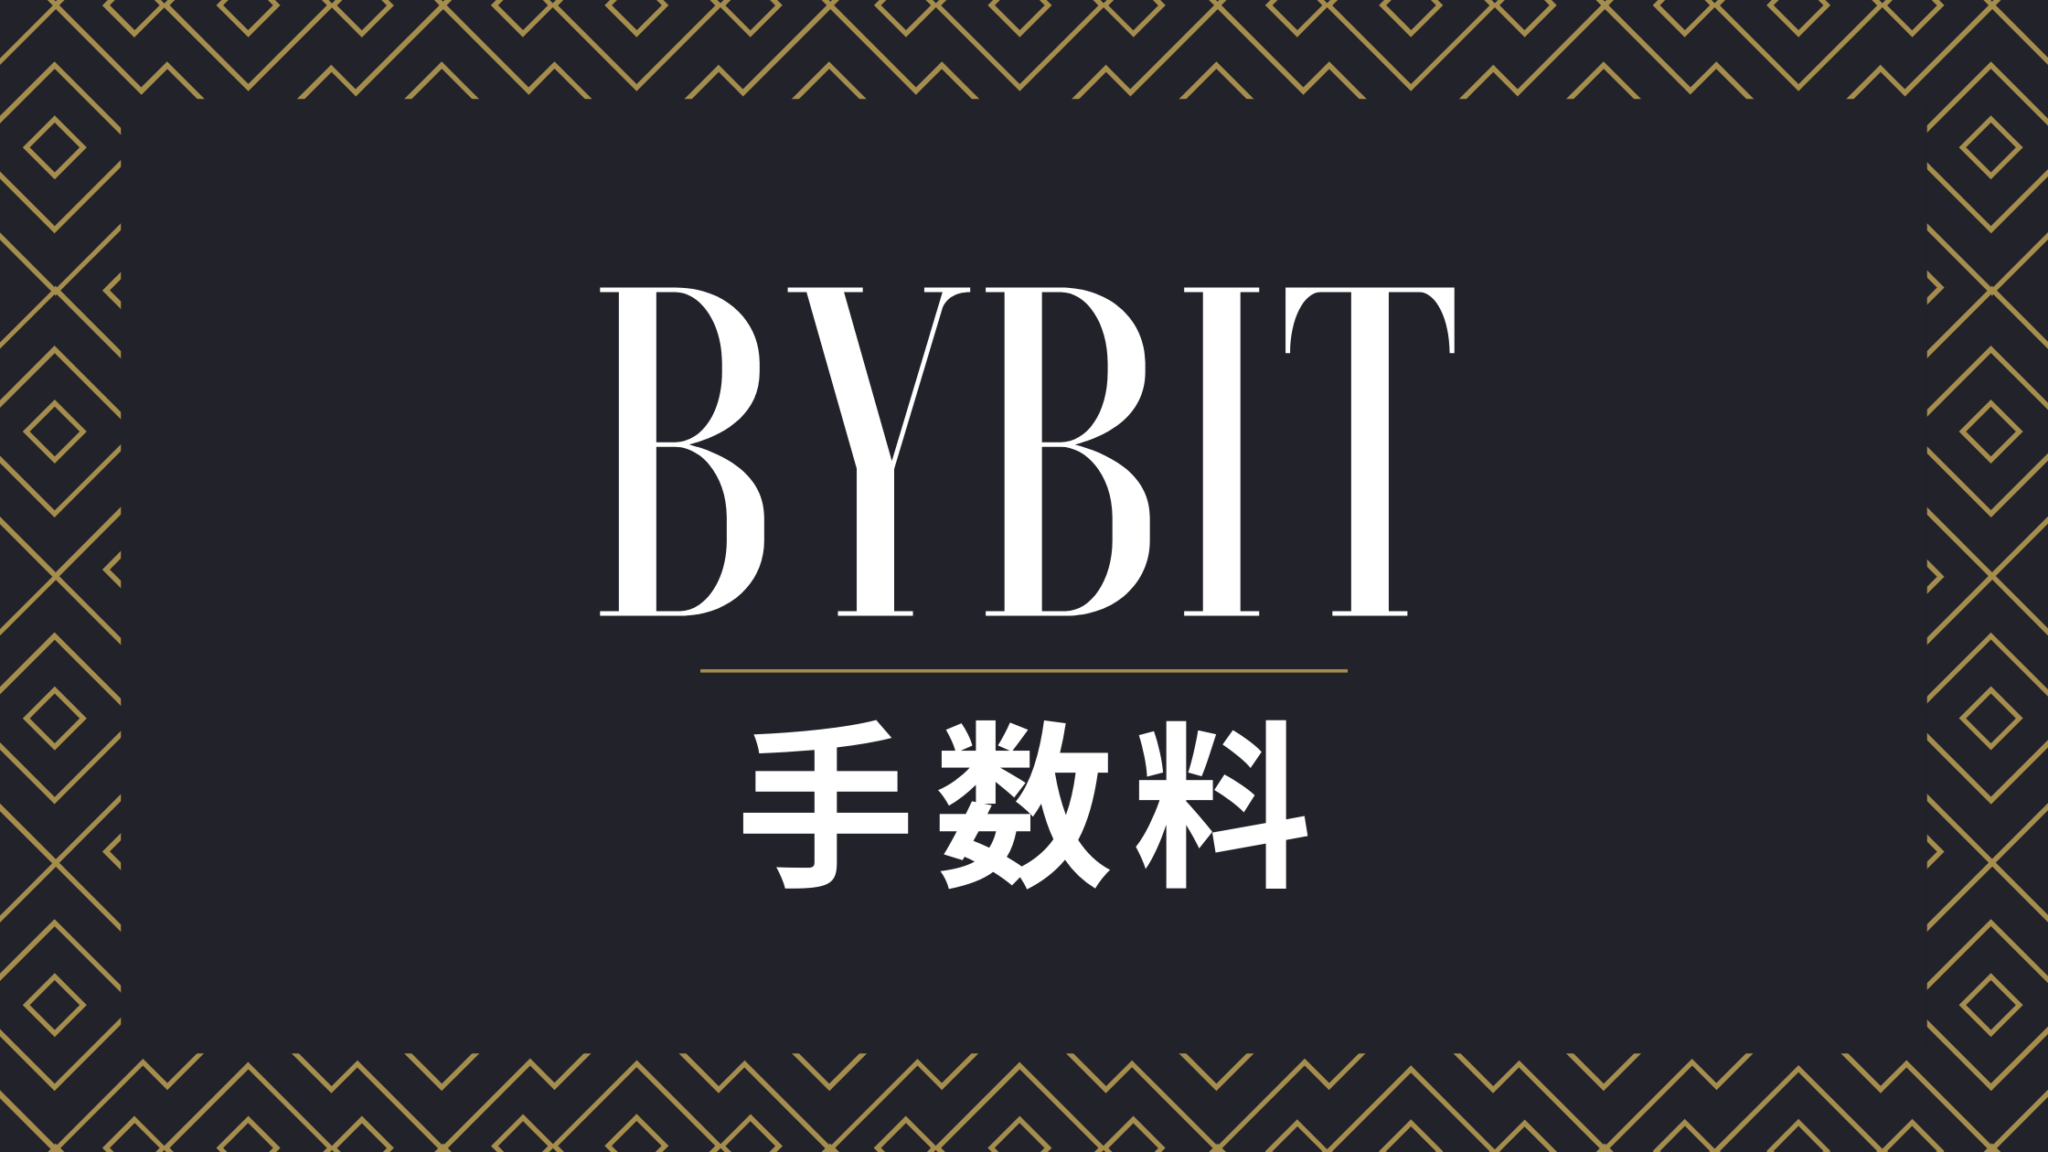 bybit(バイビット)の手数料について徹底検証!手数料で損しない方法